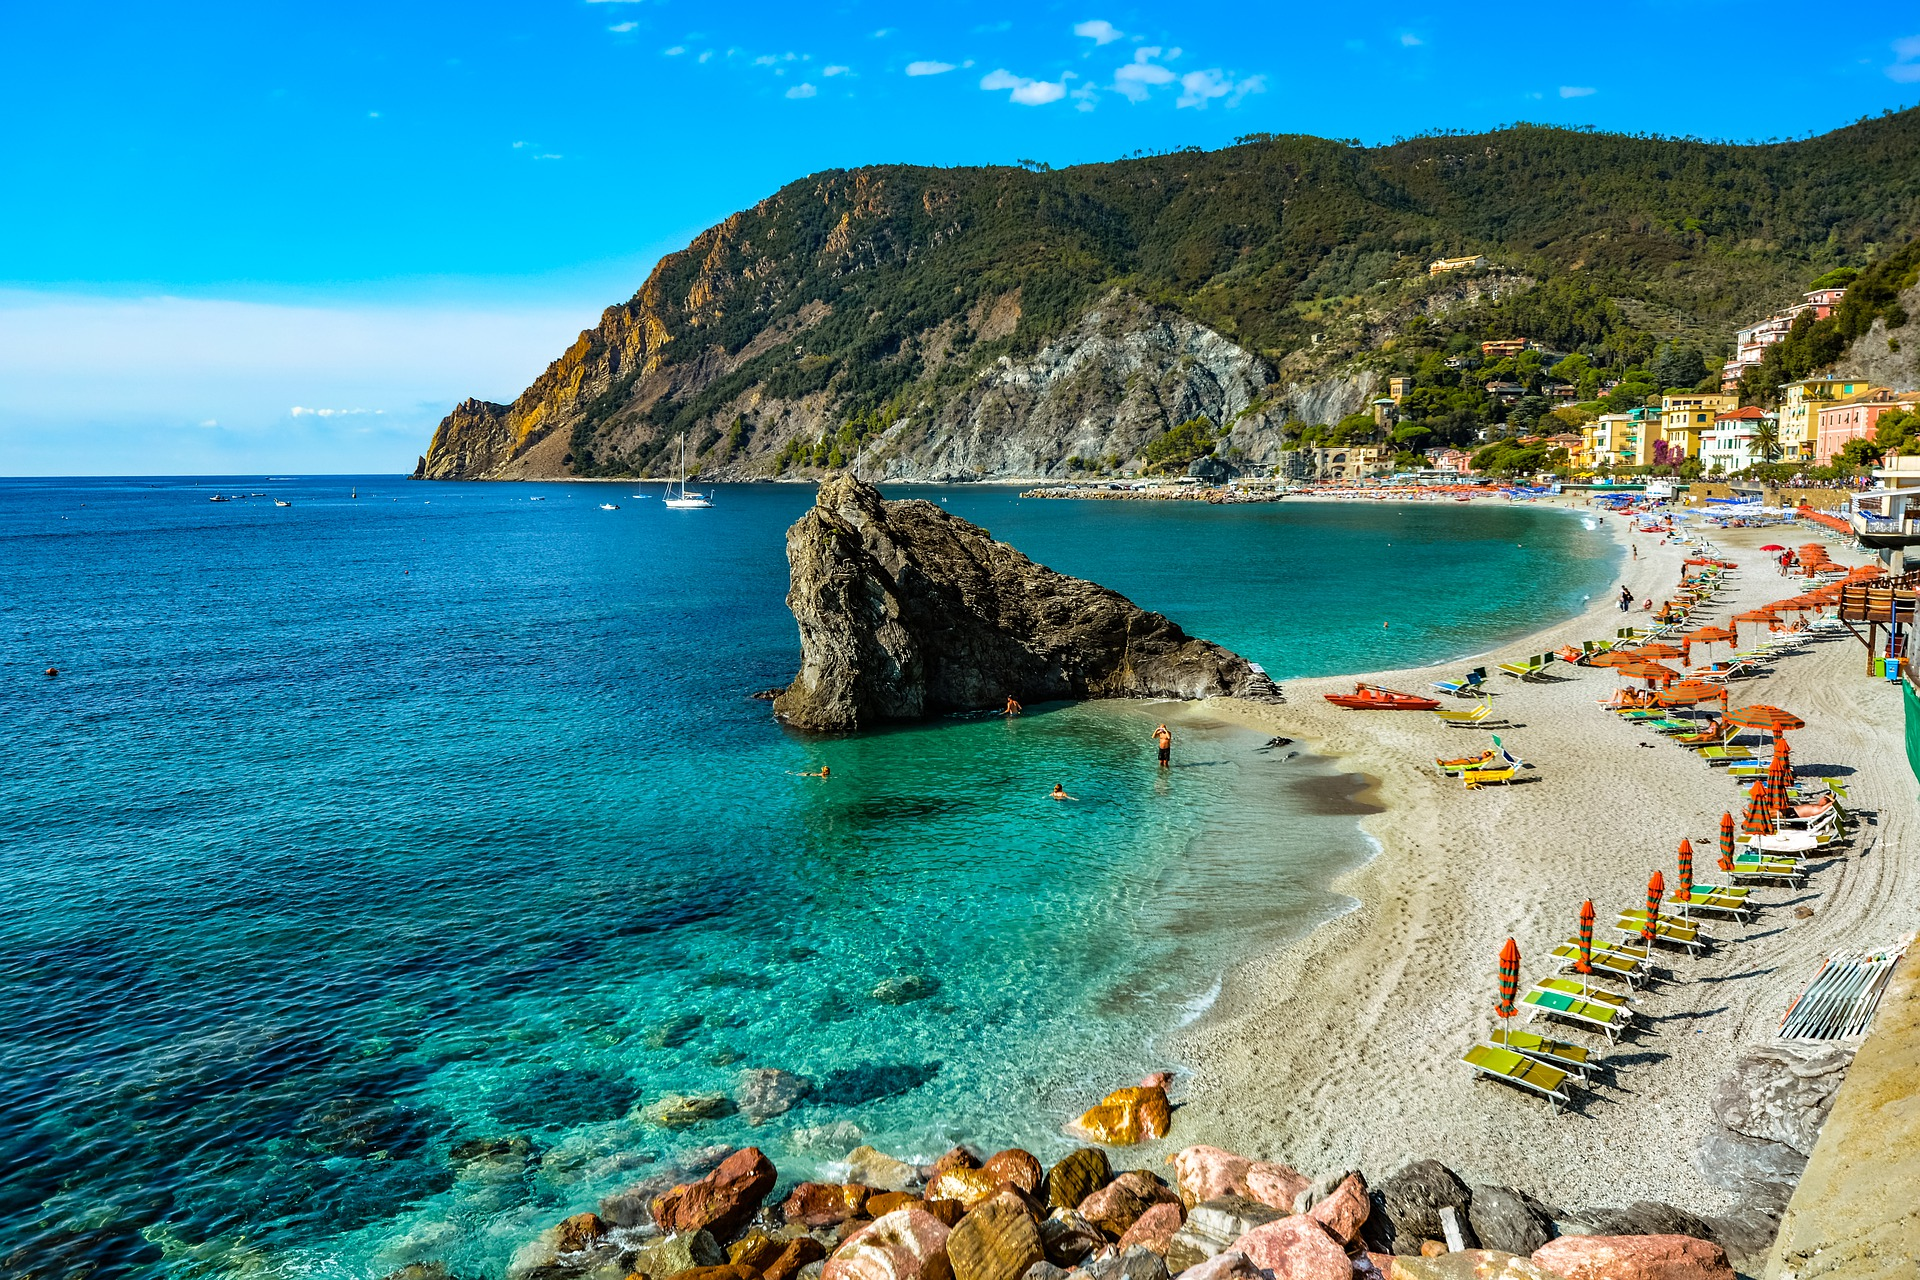 The beach at Monterosso.